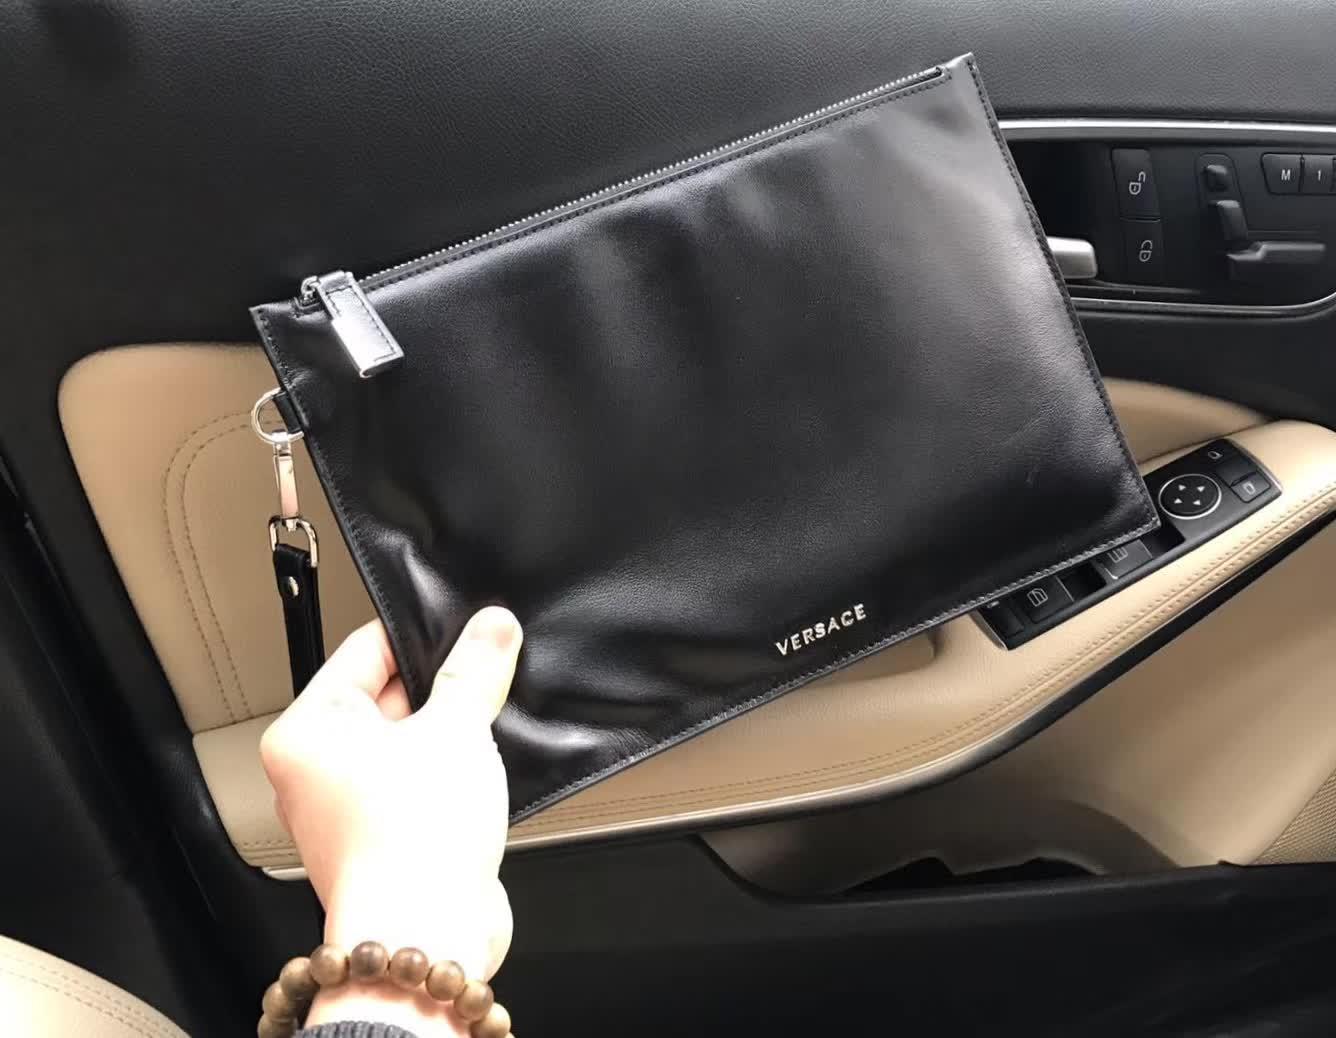 Versace 9005-5 Leather Men Clutch Bag Black